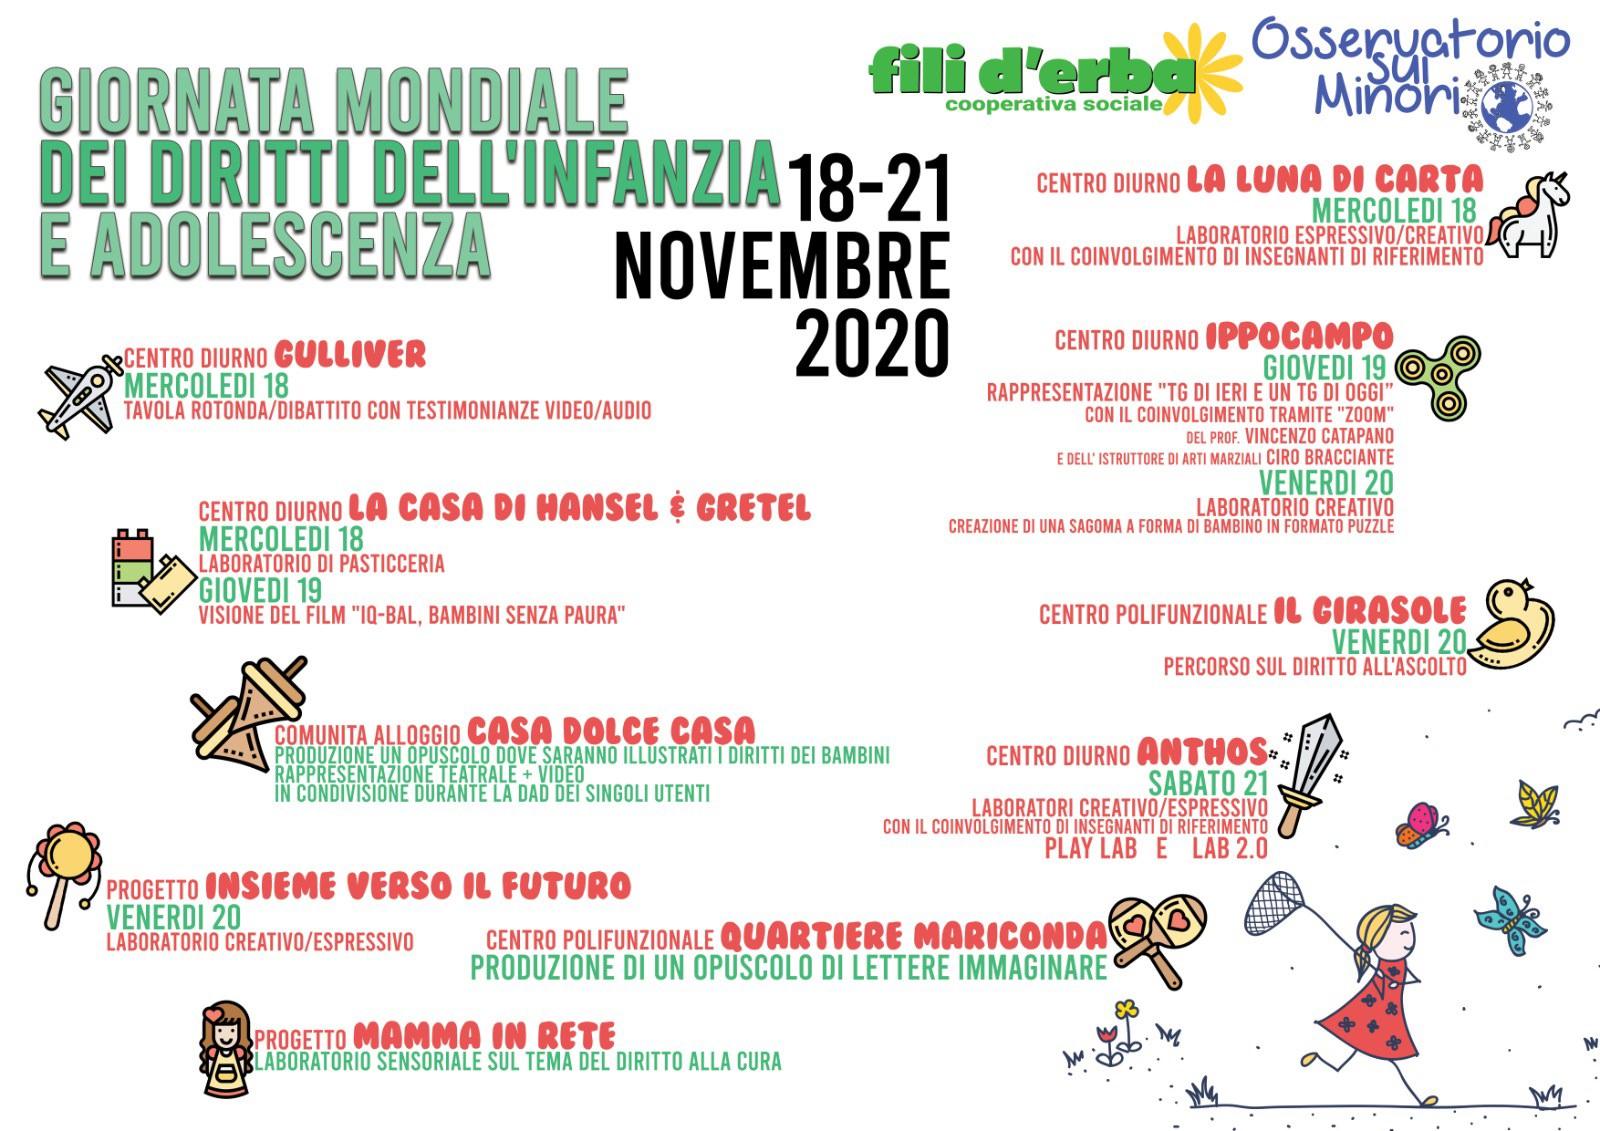 https://www.salernocitta.com/wp-content/uploads/2020/11/dde79177-3d53-457c-a3ea-e73c189de1e3.jpg